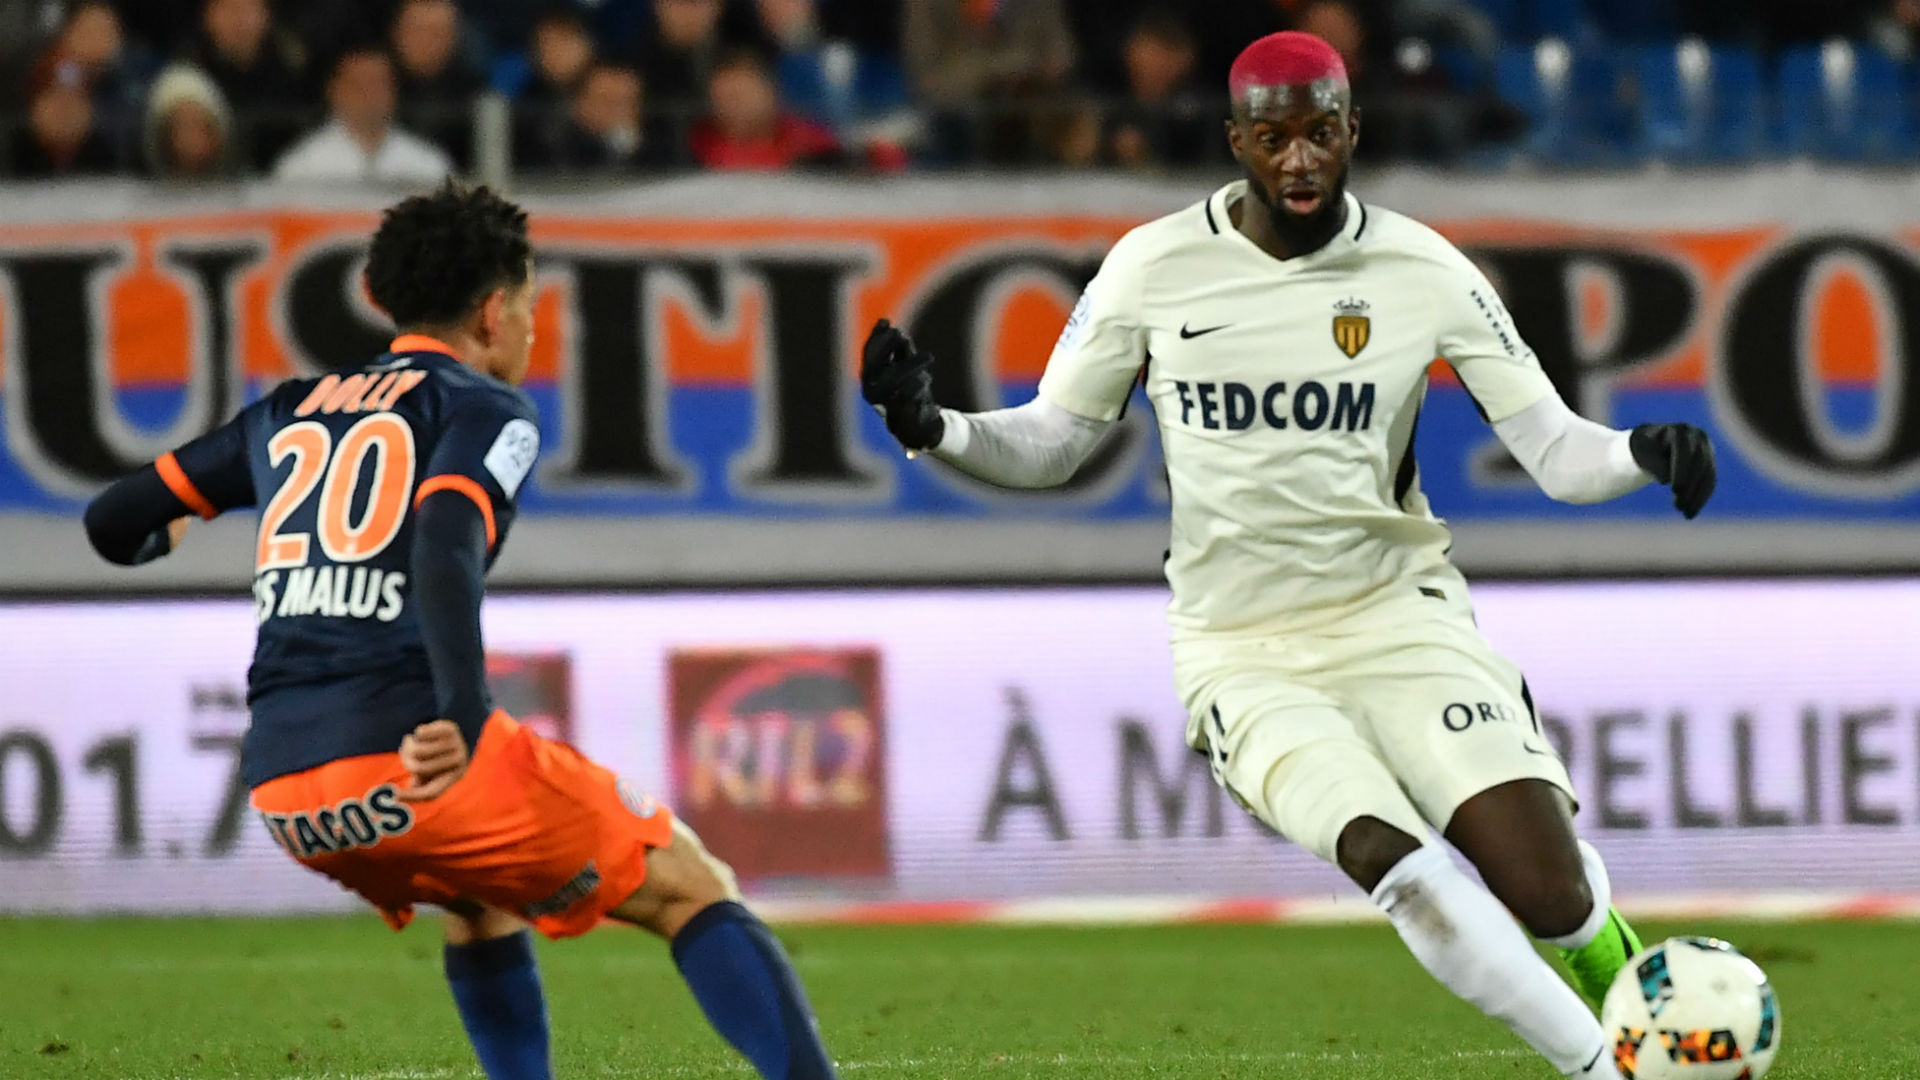 Tiemoue Bakayoko Monaco v Montpellier